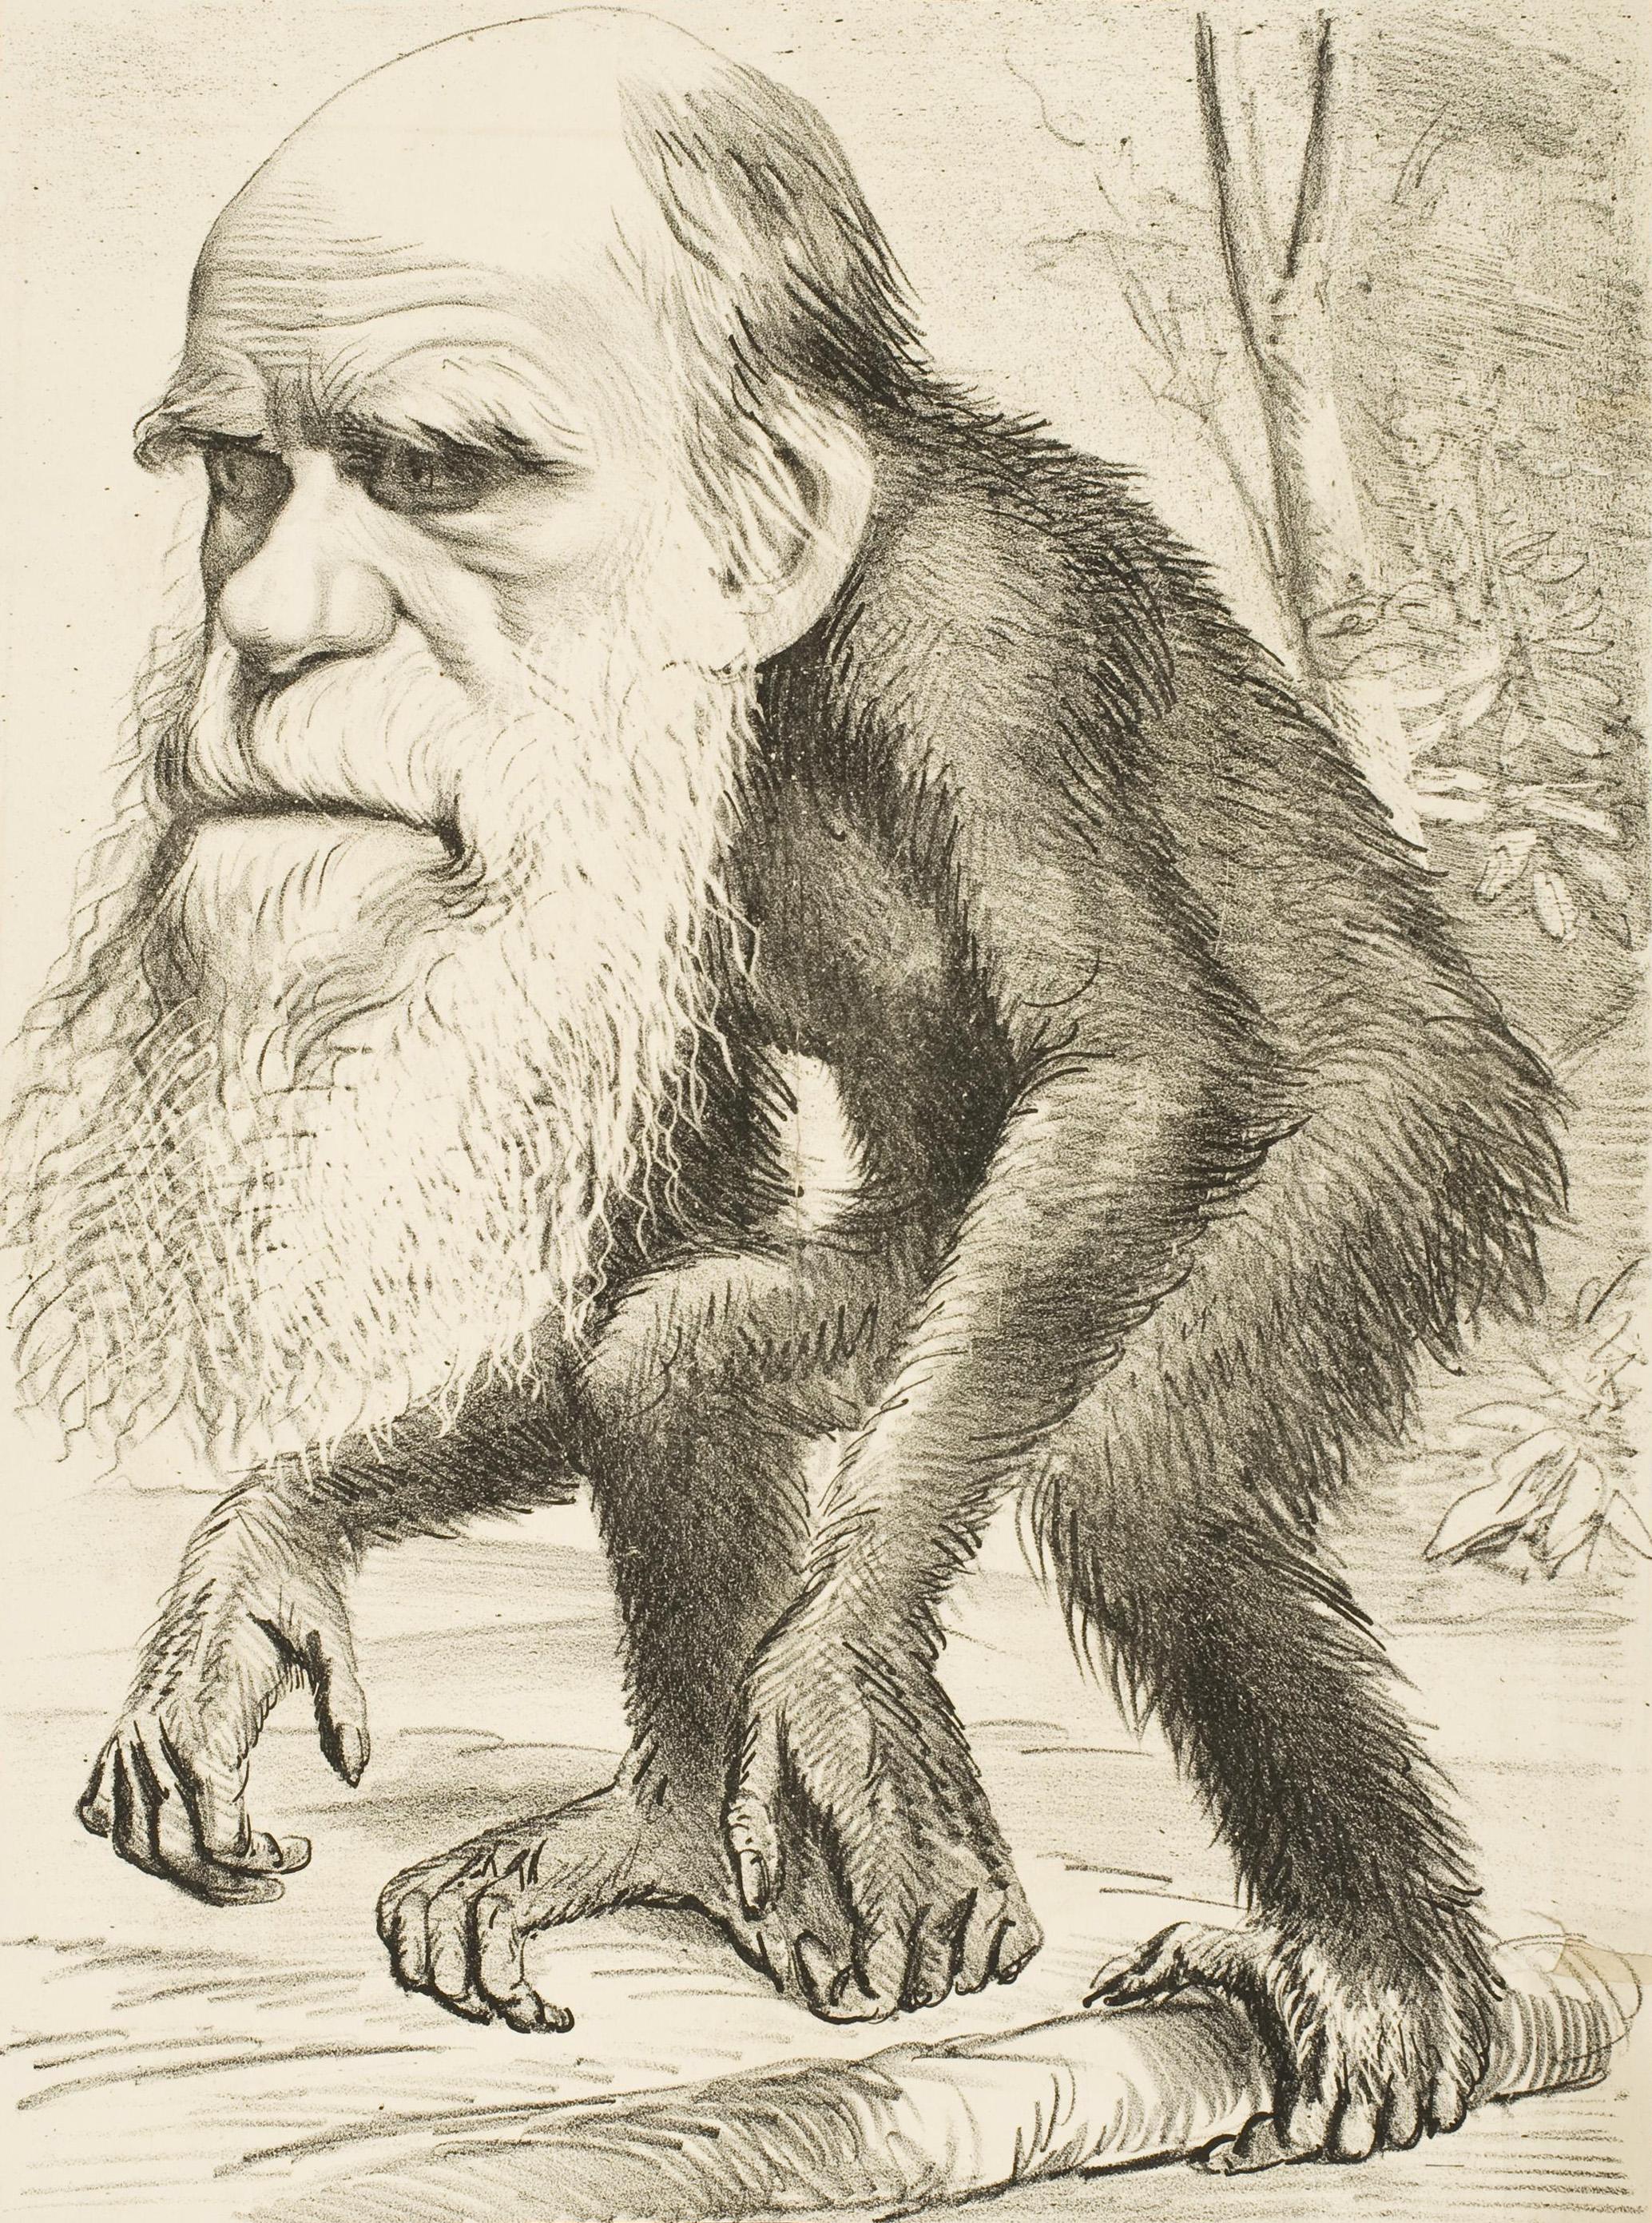 editorial_cartoon_depicting_charles_darwin_as_an_ape_28187129